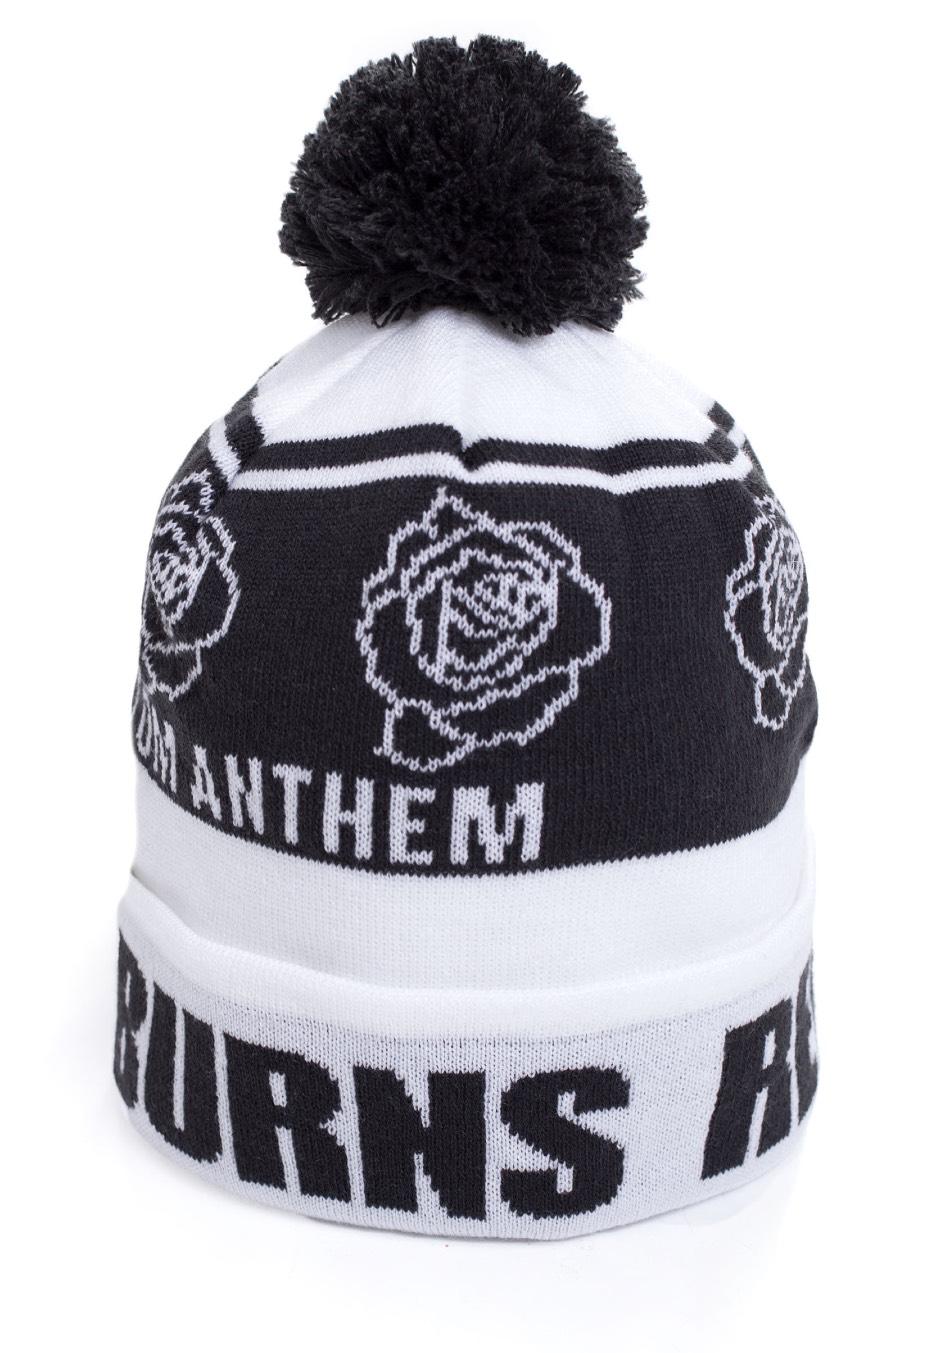 August Burns Red - Phantom Anthem Pom - Beanie - Official Melodic Metal  Merchandise Shop - Impericon.com Worldwide c86c1ca44544